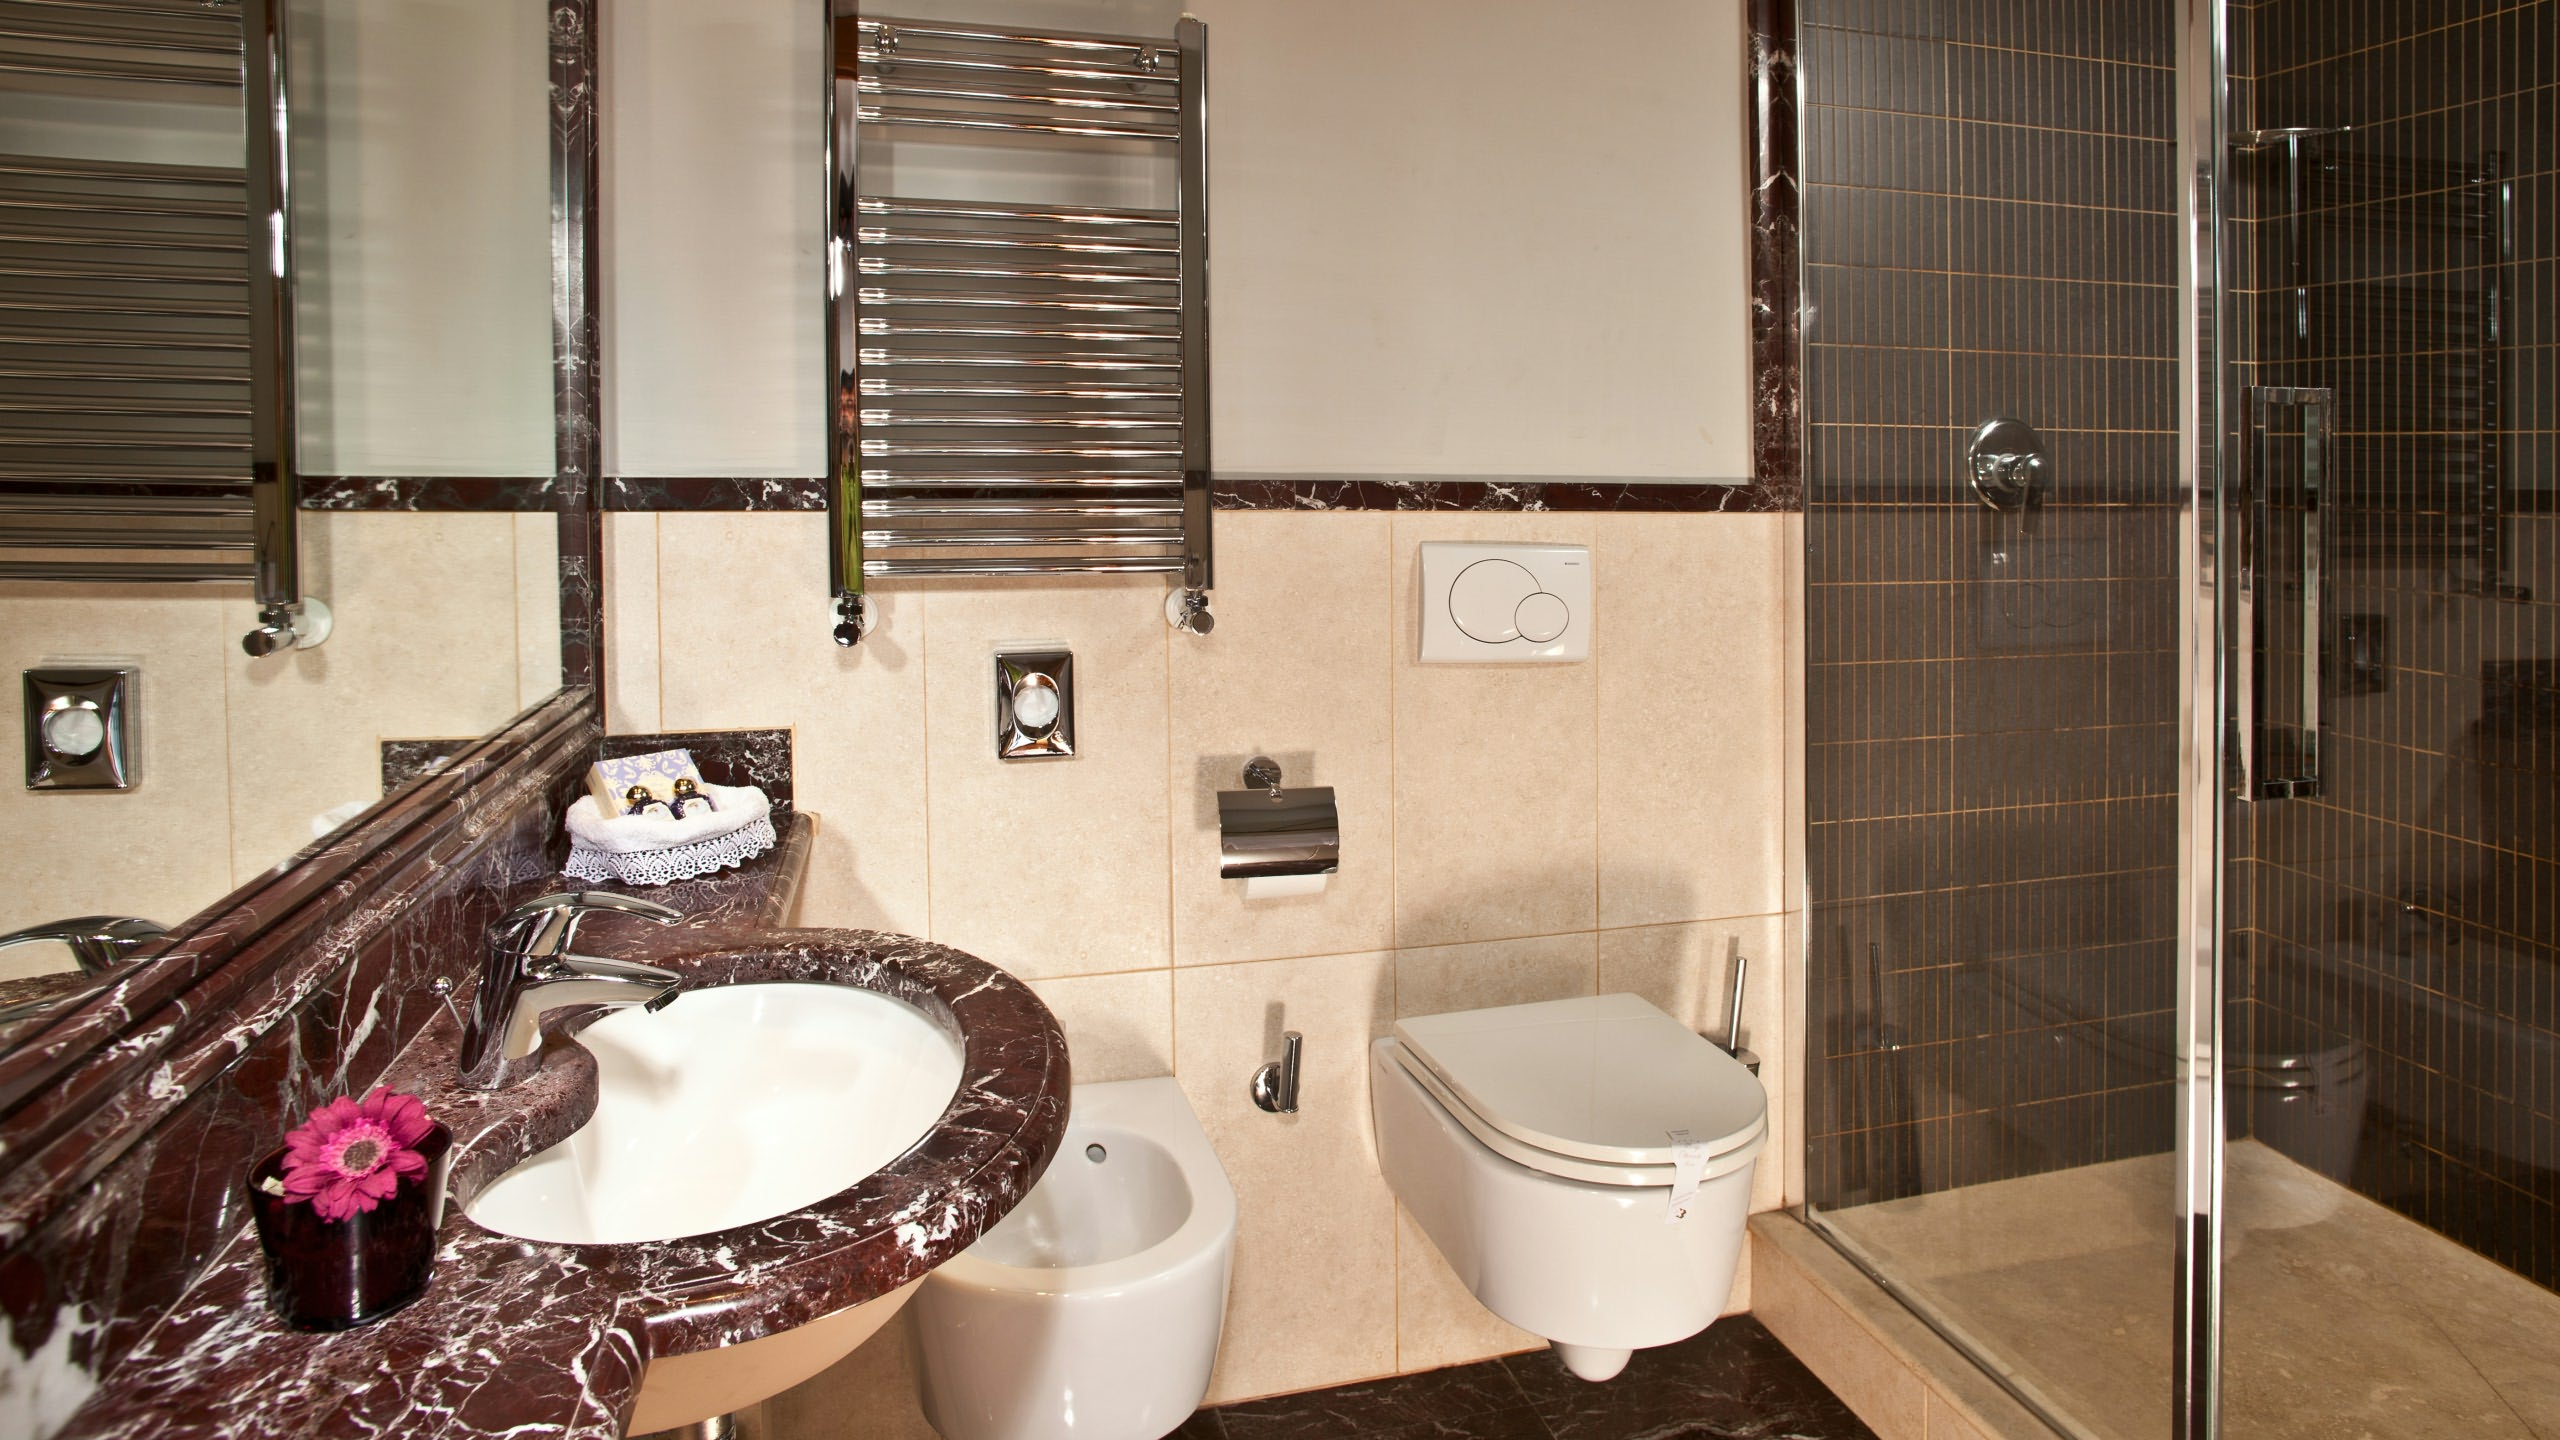 albergo-ottocento-rome-salle-de-bain-21